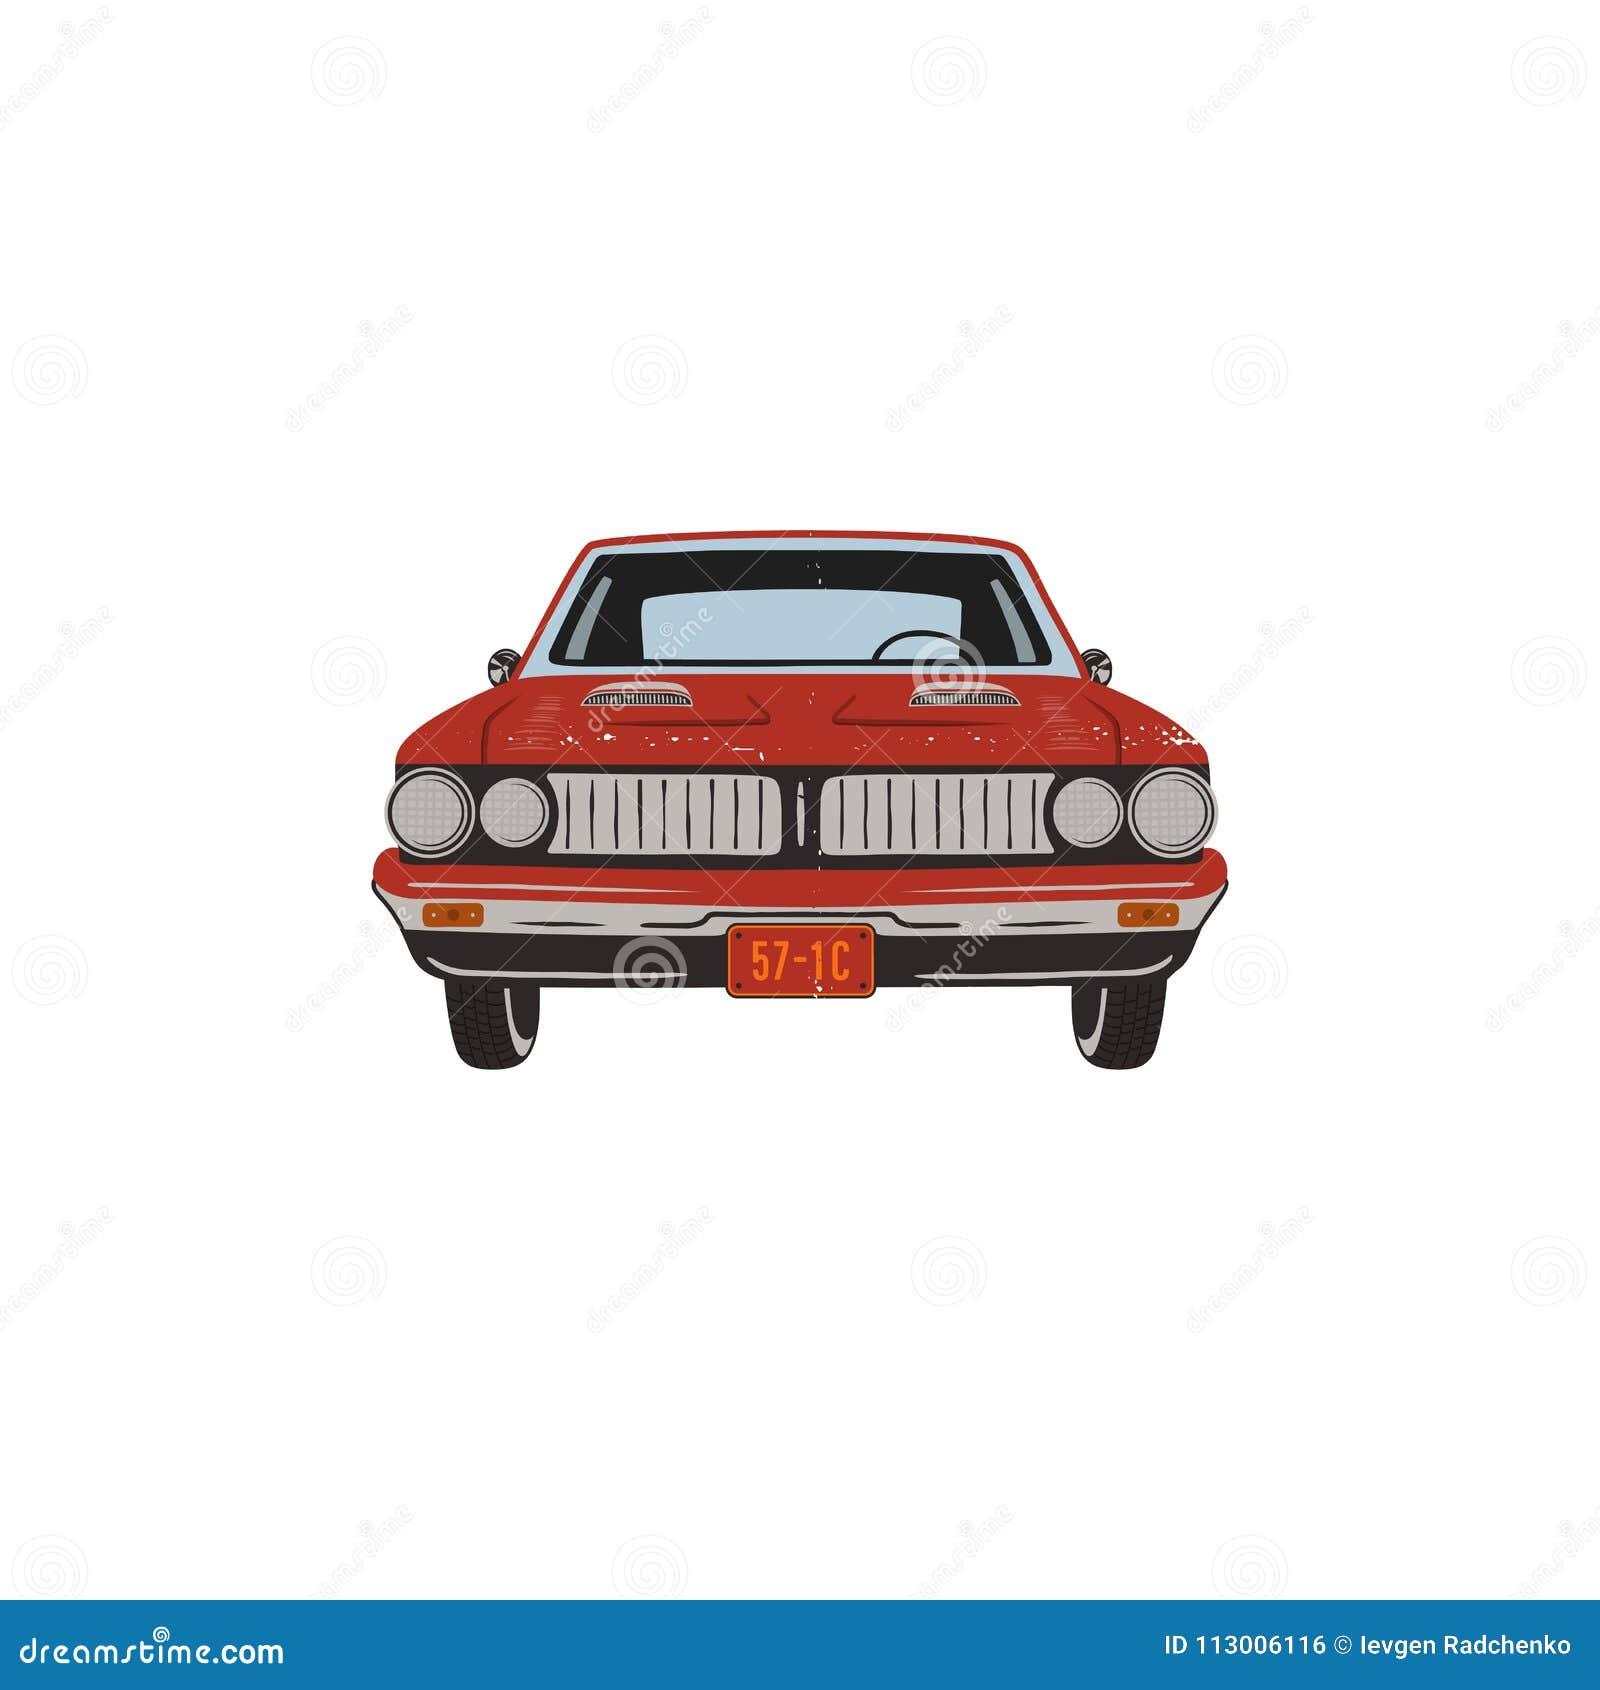 Vintage Hand Drawn Muscle Car Retro Red Car Symbol Design Classic